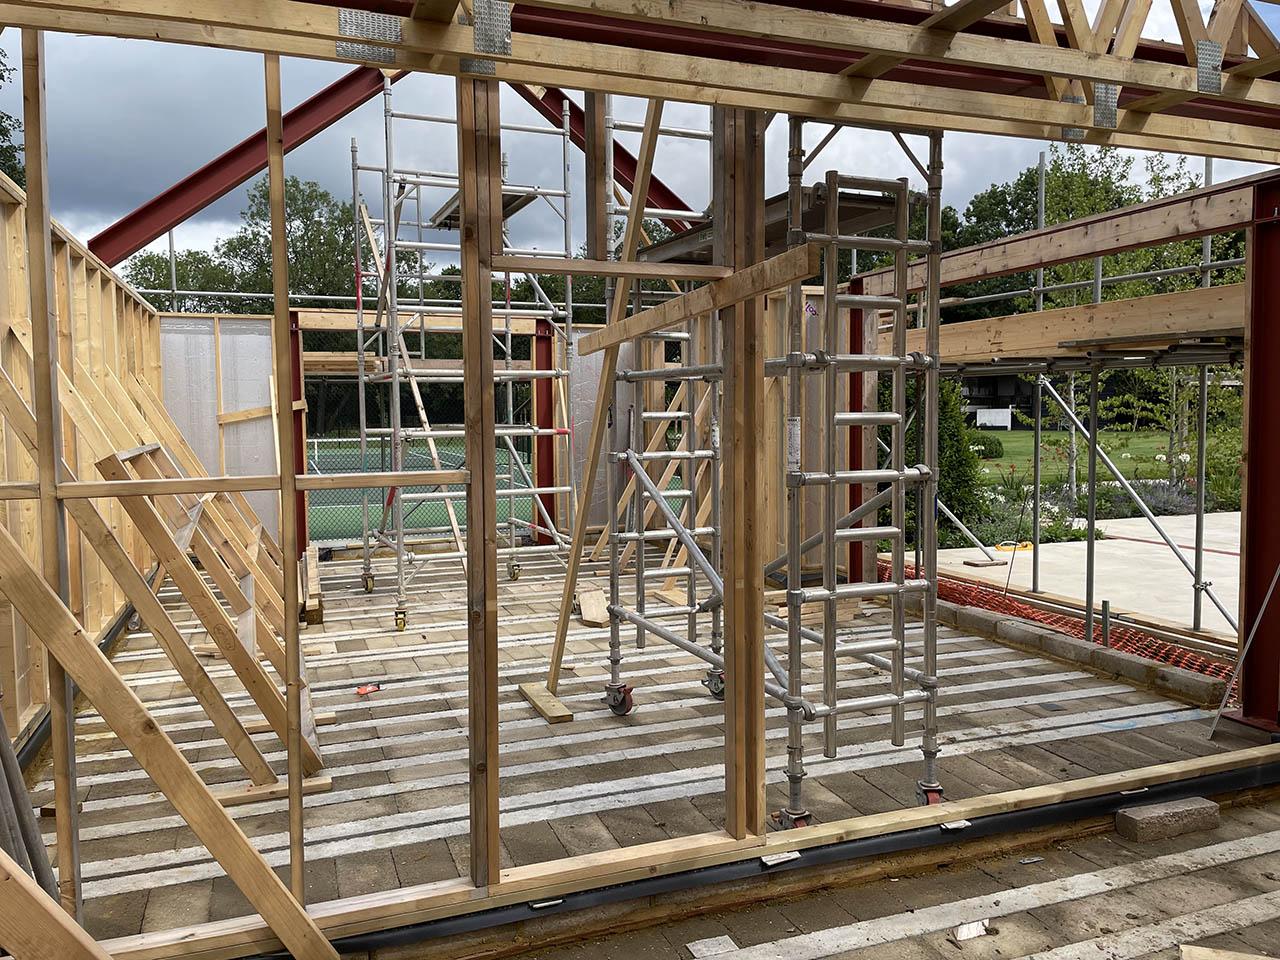 Scandia-Hus Swimming Pool House Frame Up